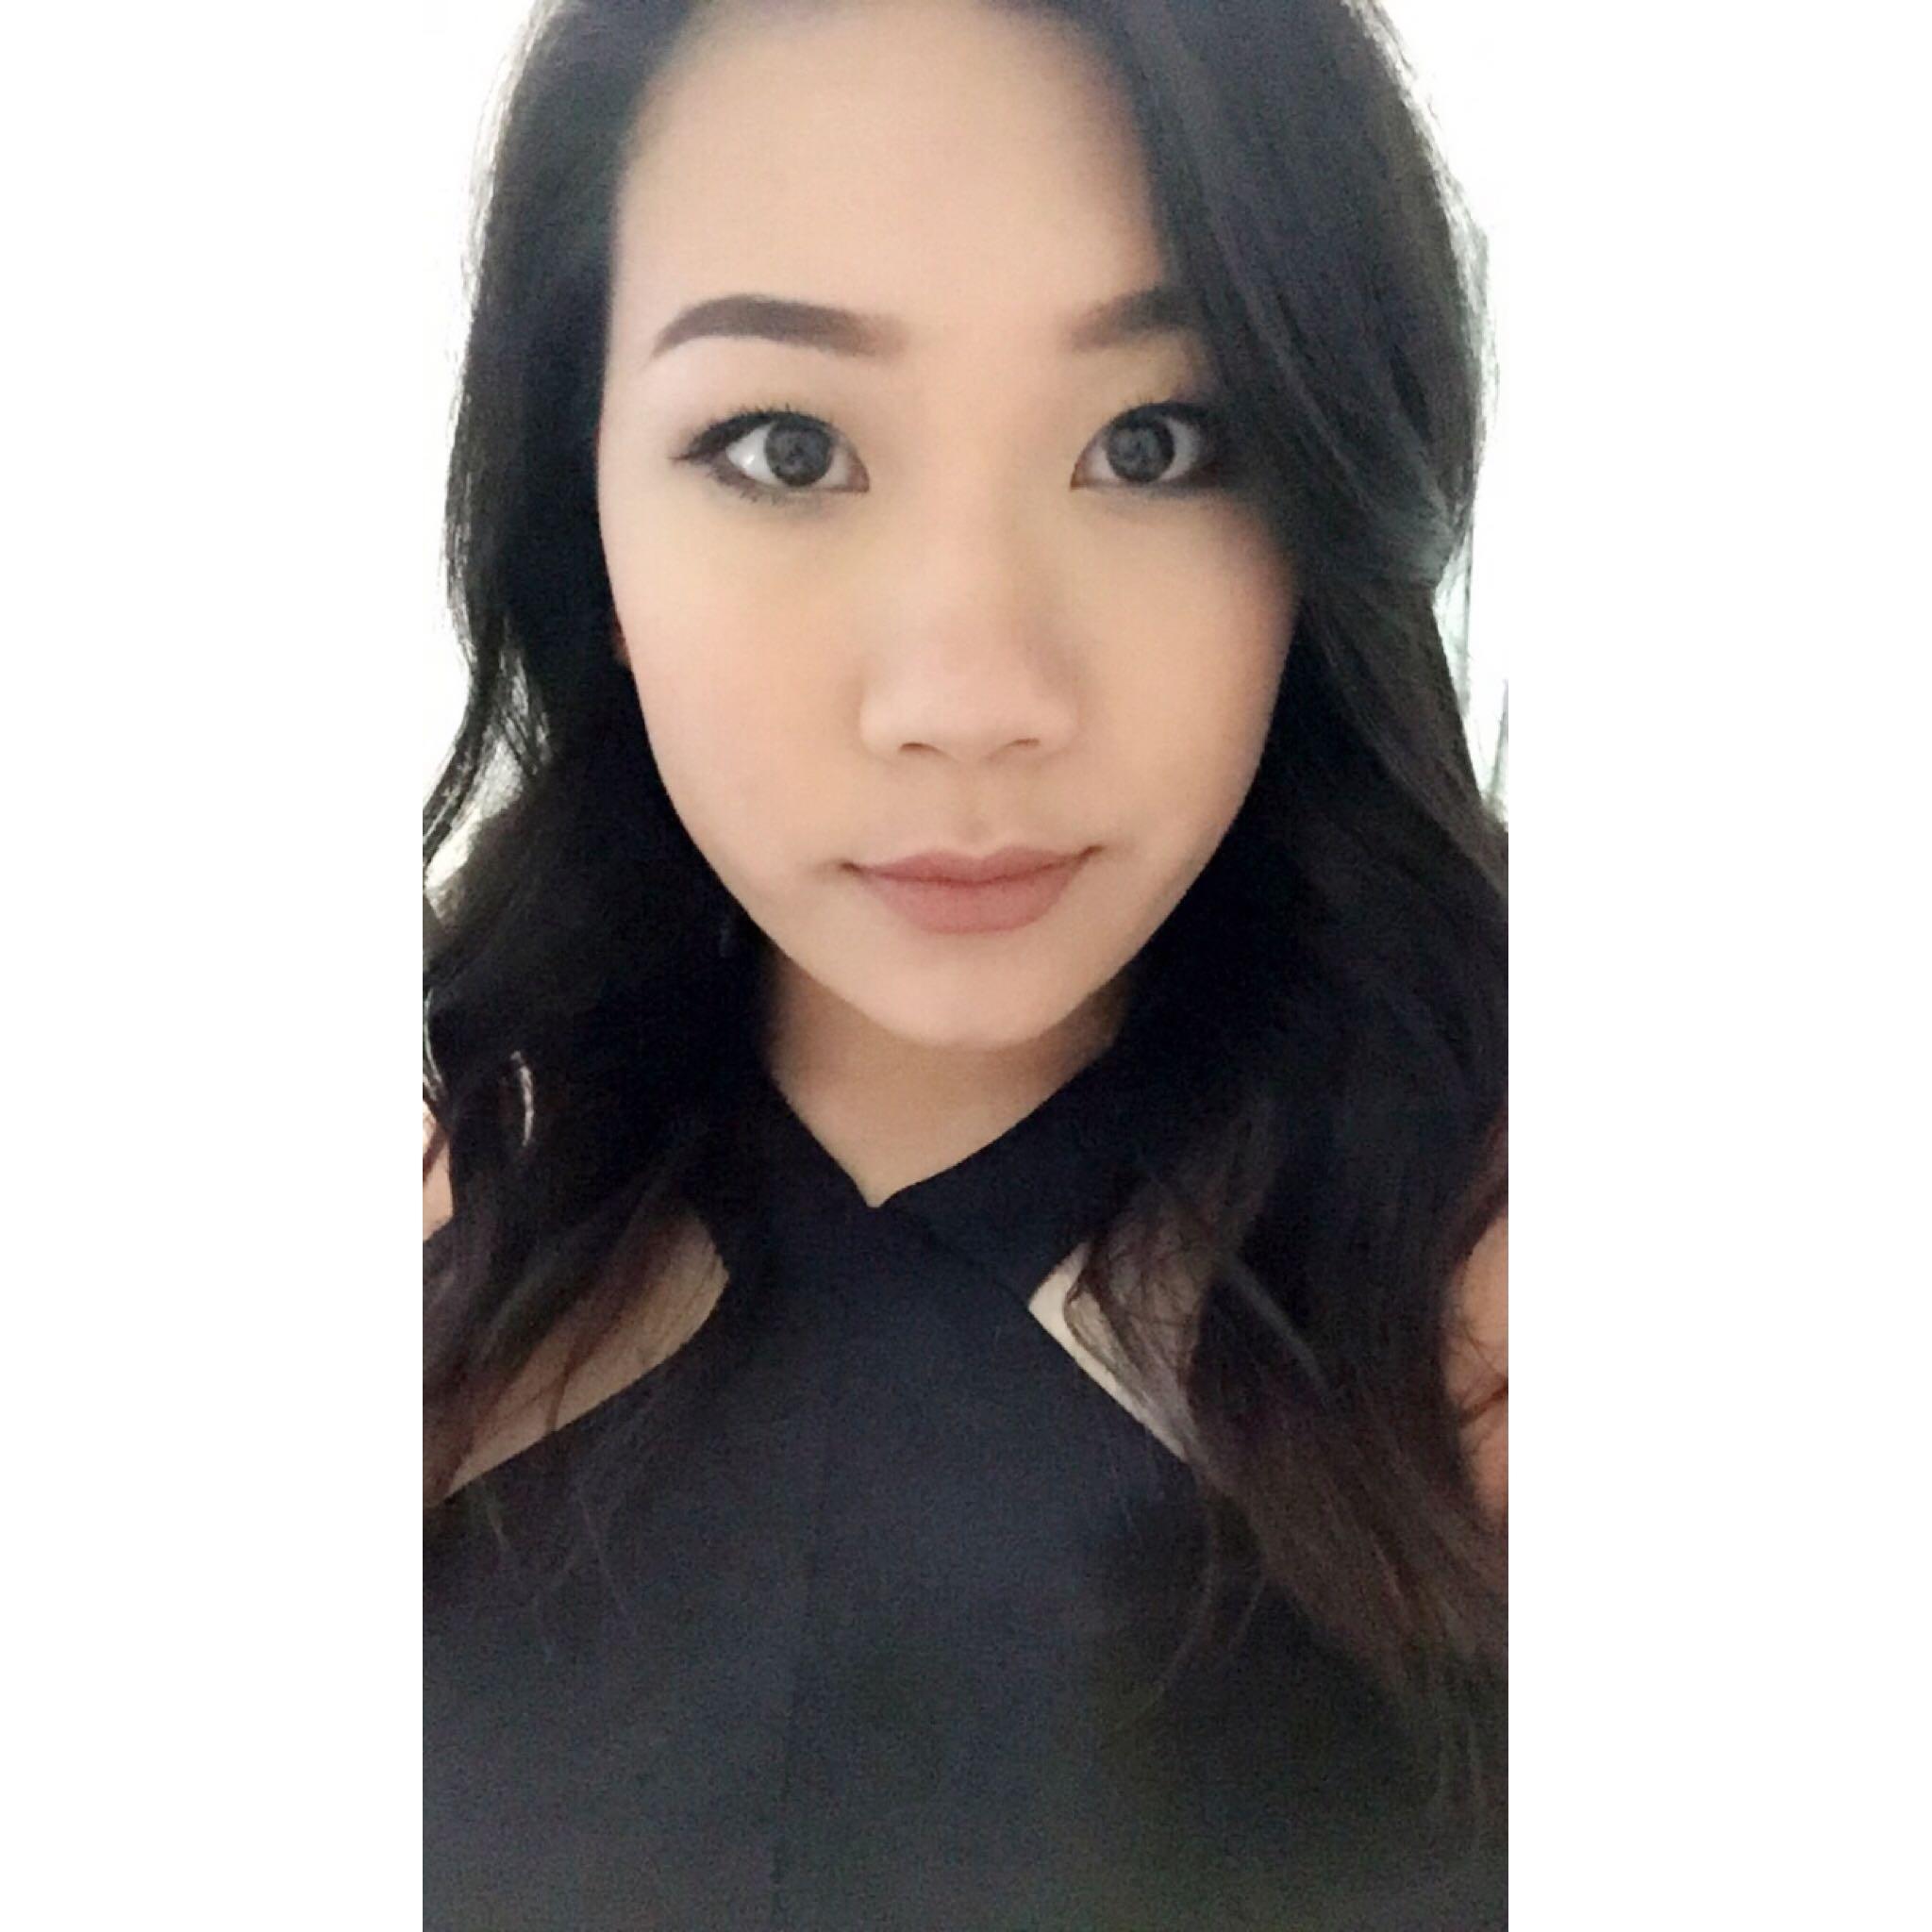 smileymarcy